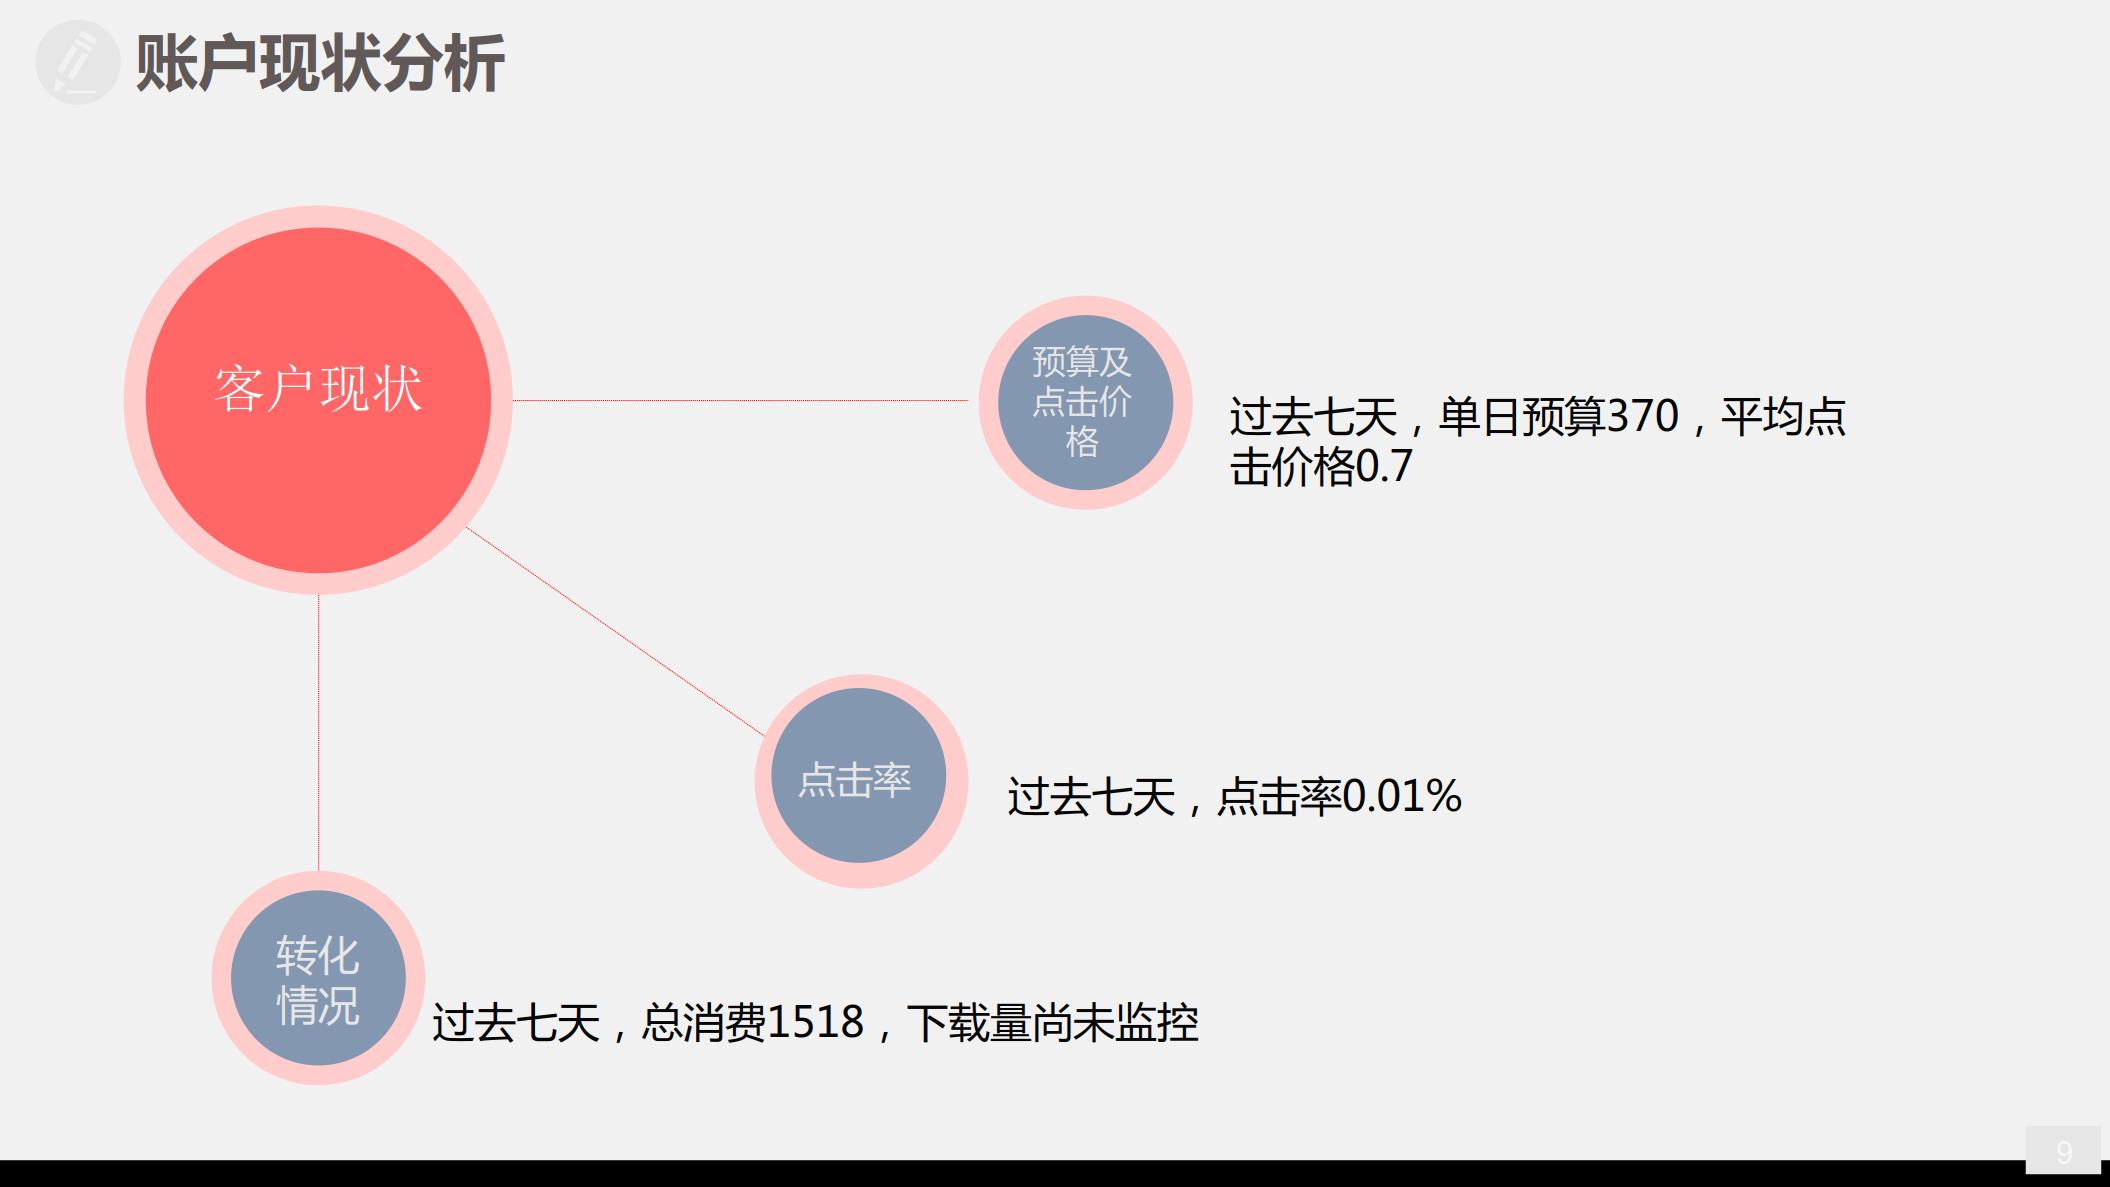 F1+vbj村小爱+软件游戏+张洁0608_9.png